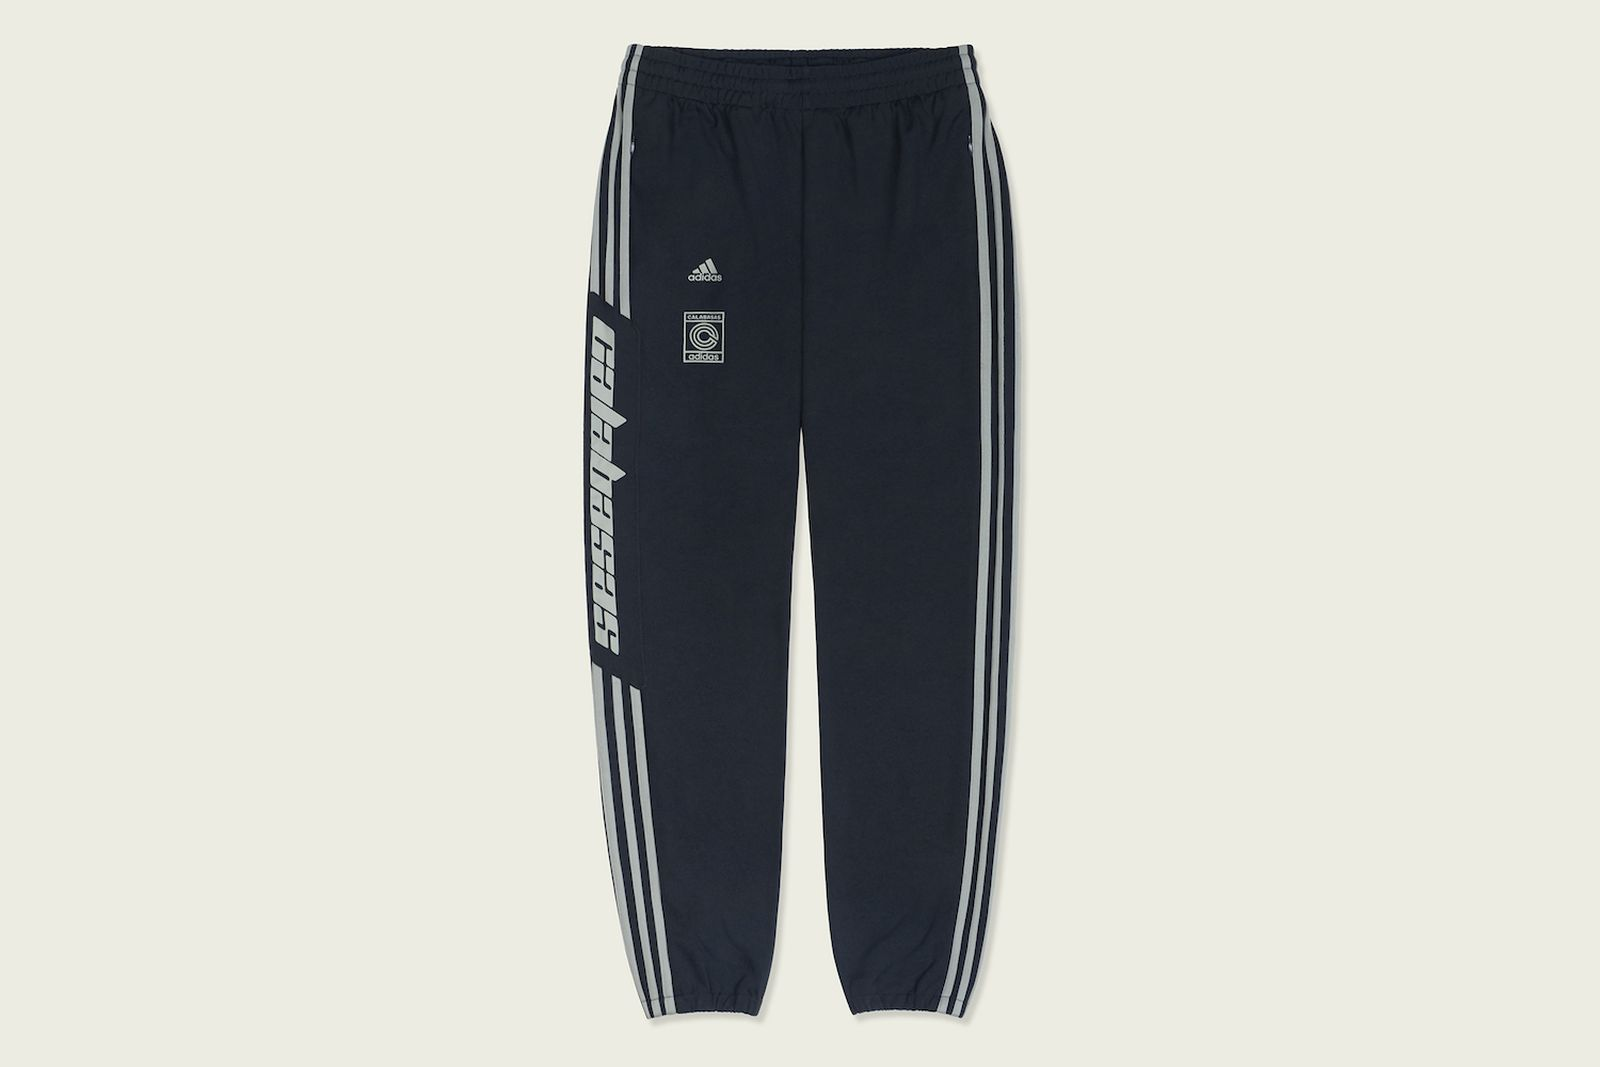 adidas kanye west calabasas track pants ink wolves luna wolves release date adidas Calabasas adidas YEEZY Calabasas